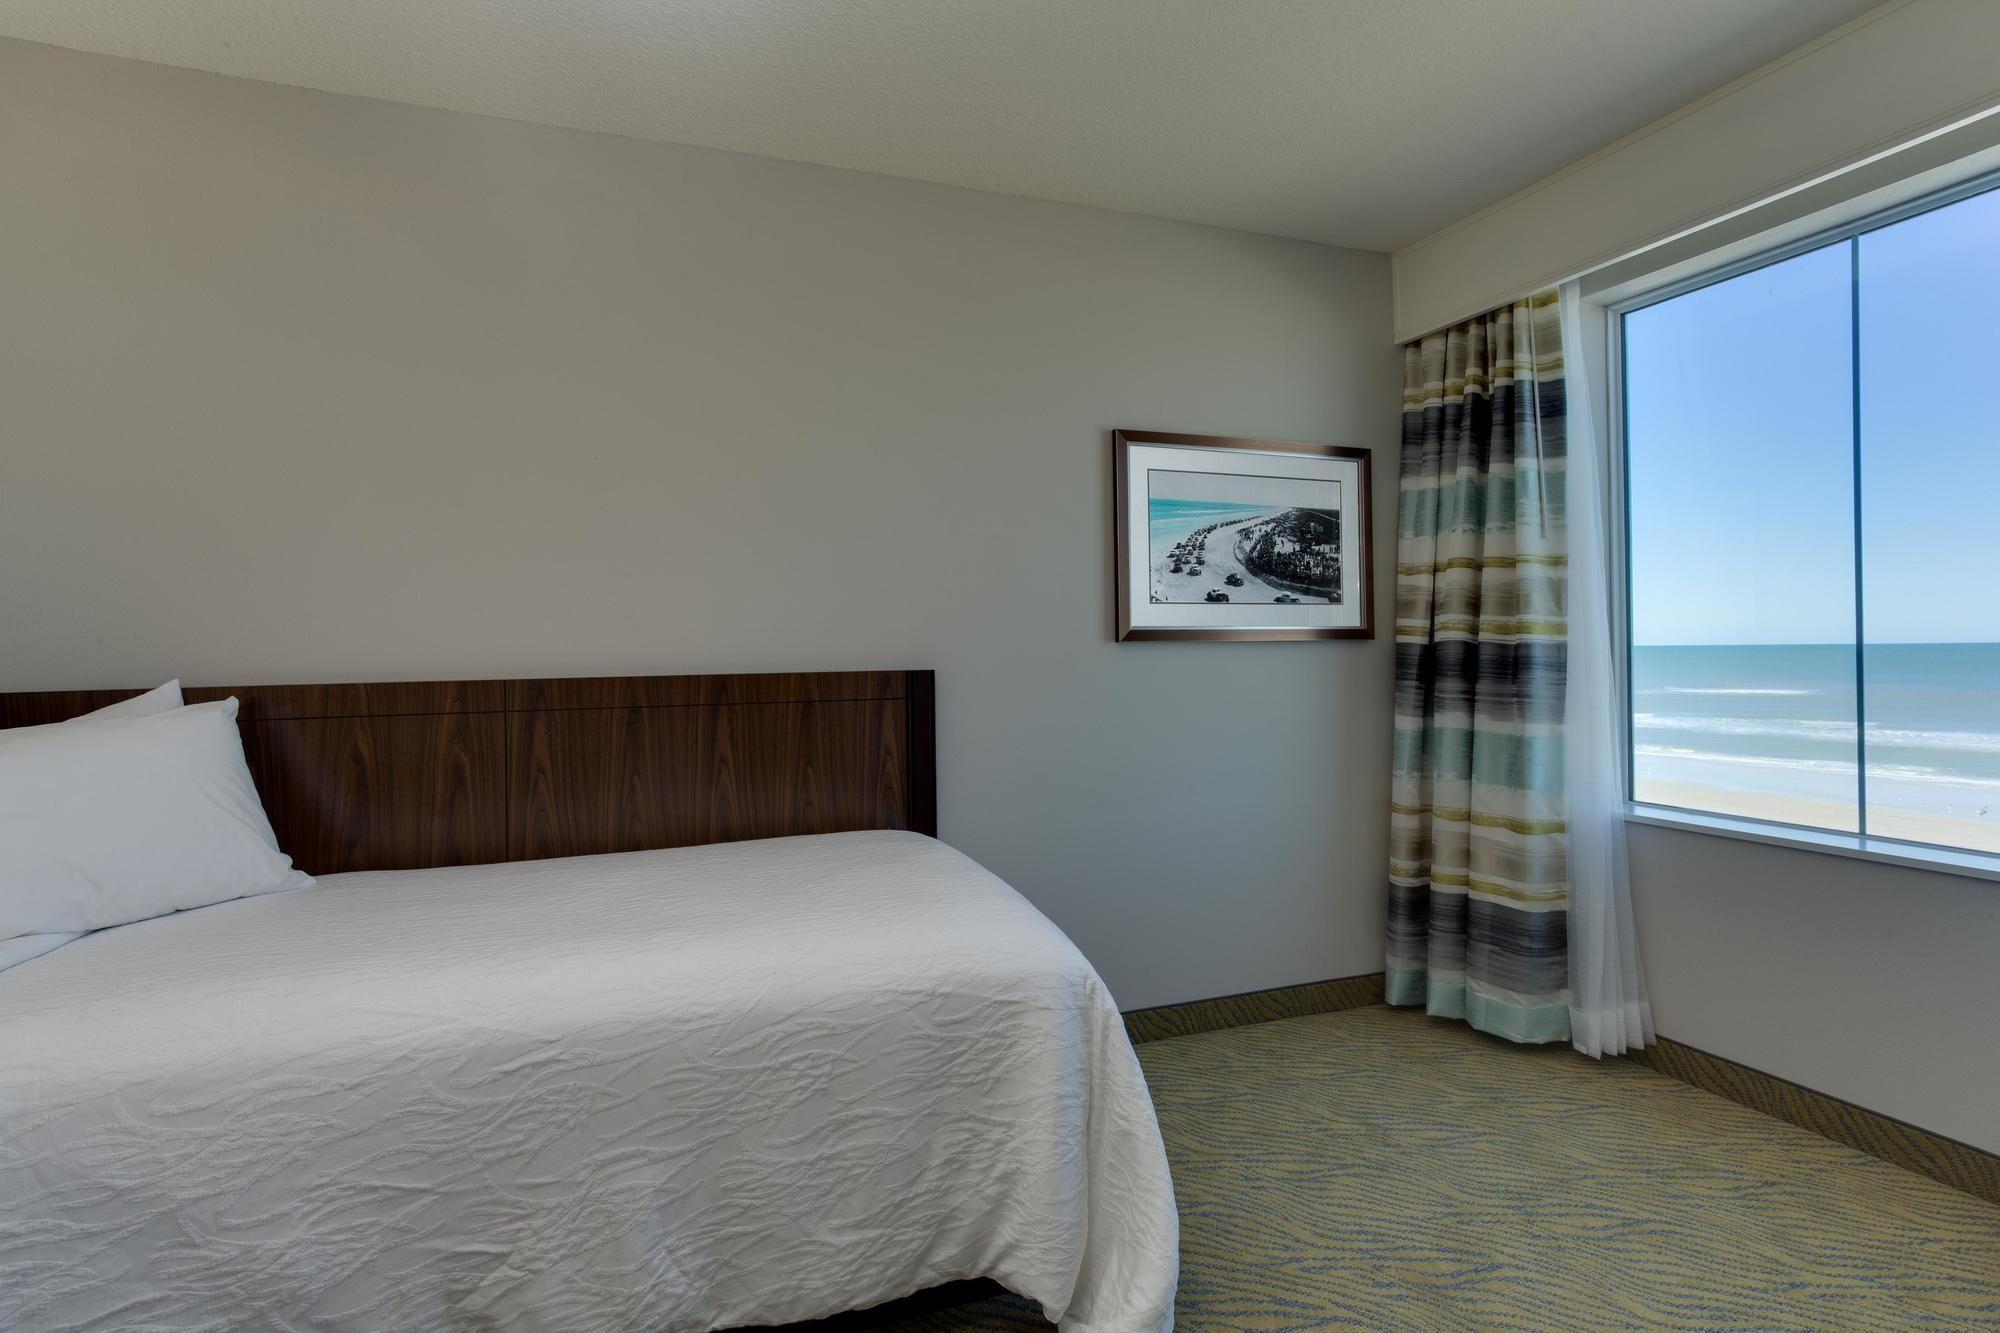 fl hilton garden inn daytona beach oceanfront in holly hill fl - Hilton Garden Inn Daytona Beach Oceanfront